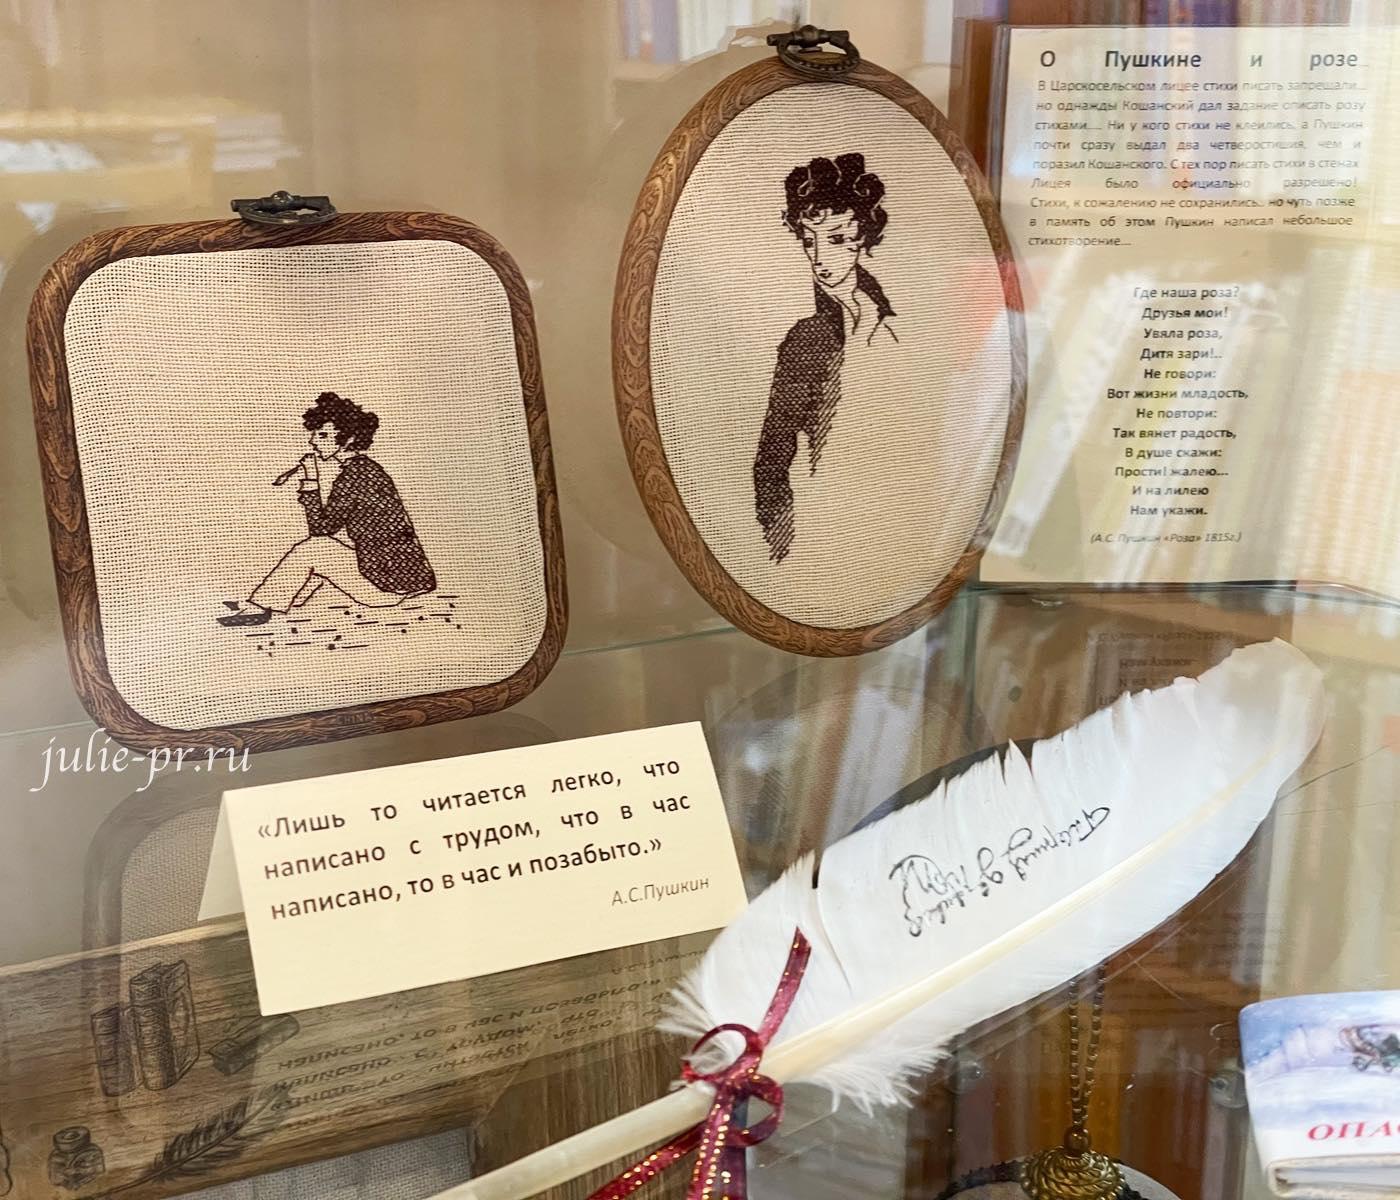 вышивка крестом, Пушкин, выставка Нам Пушкинских стихов звучал ноктюрн